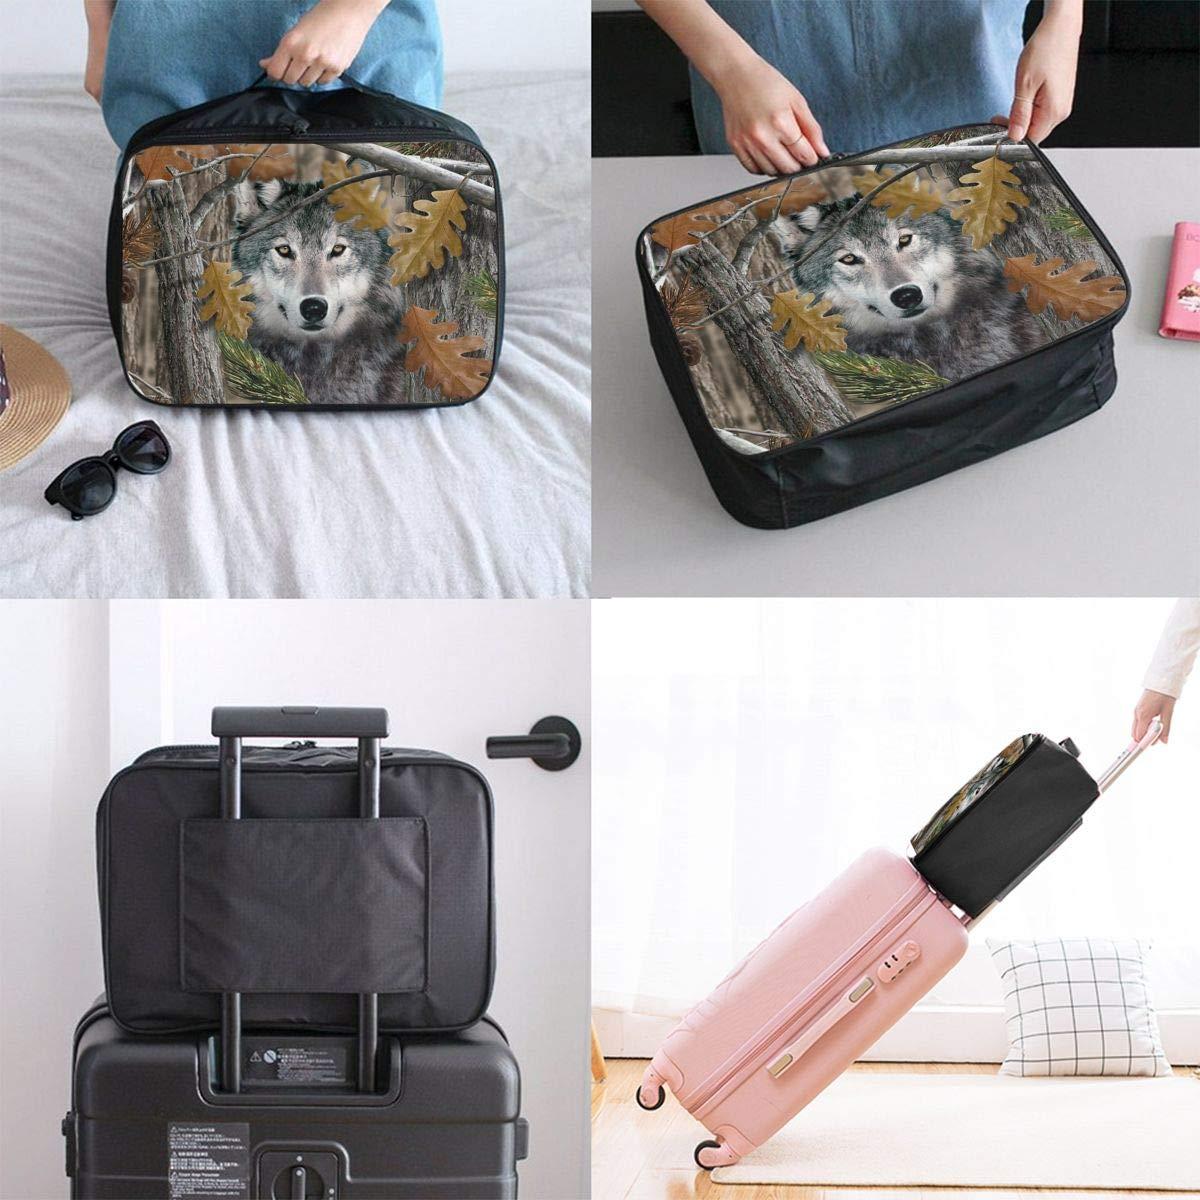 ADGAI Camo Wolf Canvas Travel Weekender Bag,Fashion Custom Lightweight Large Capacity Portable Luggage Bag,Suitcase Trolley Bag